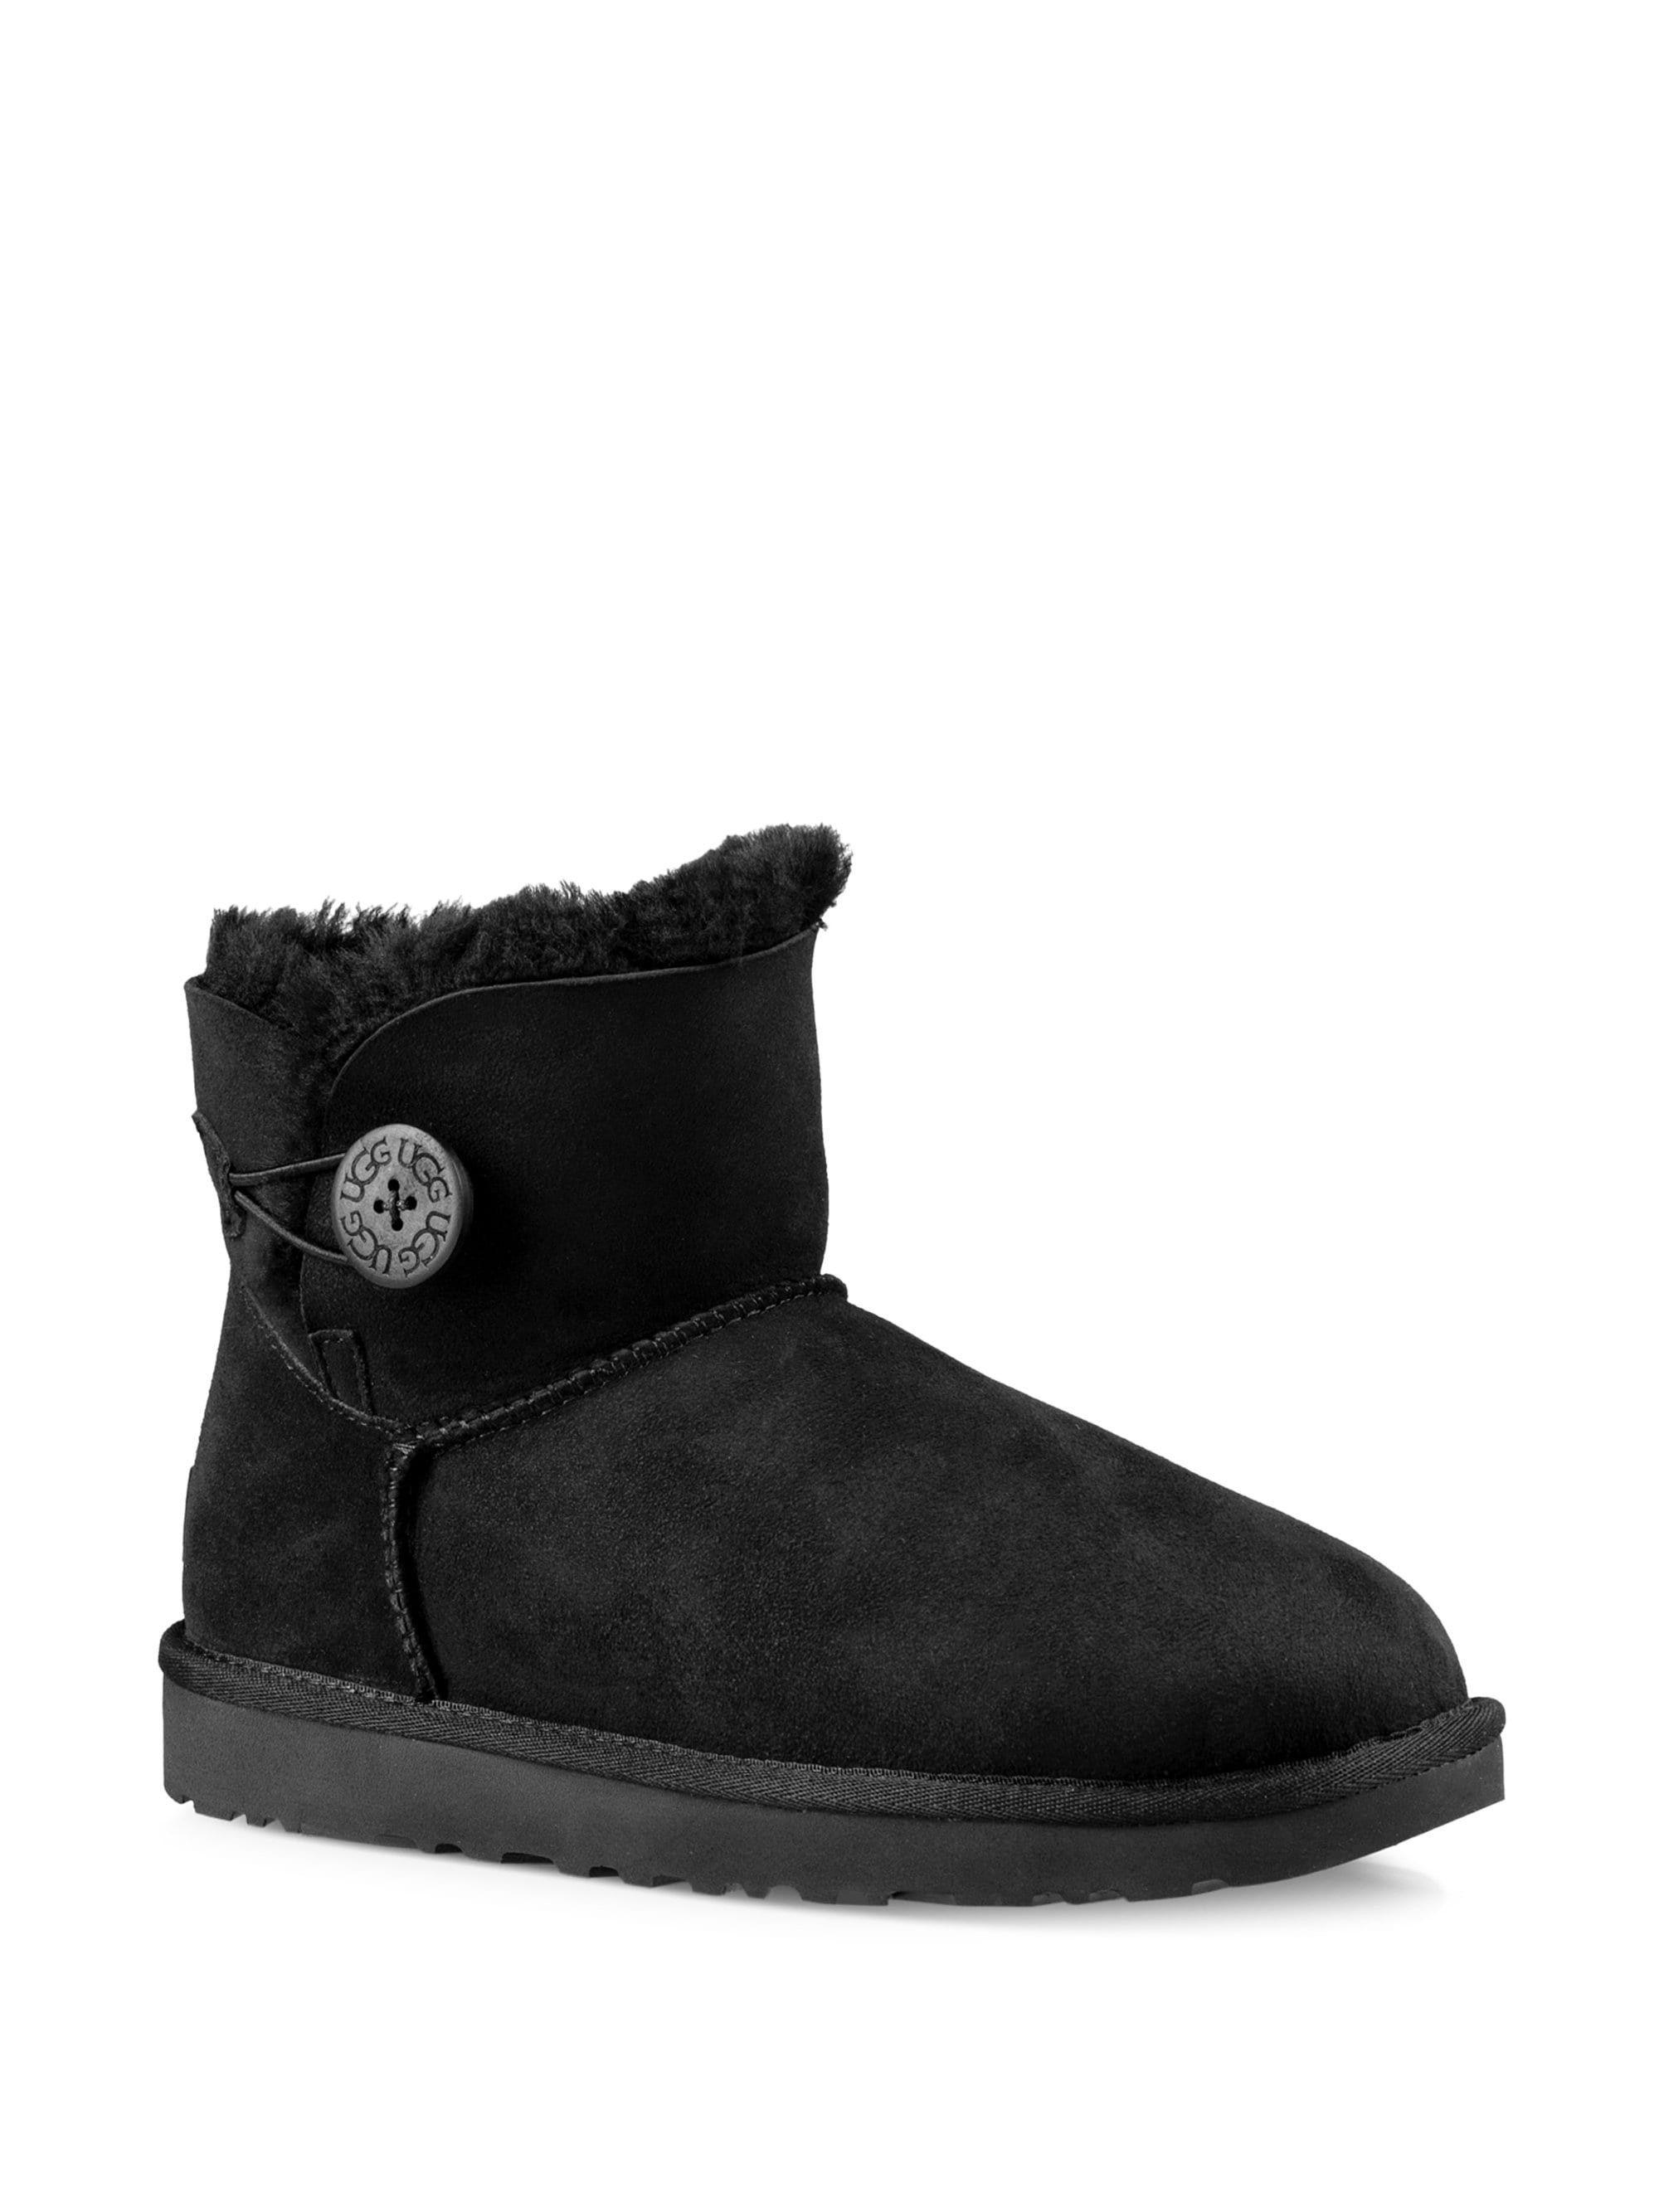 00cf673e09 Ugg Australia Mini Bailey Button Ankle Boots - Chestnut 10